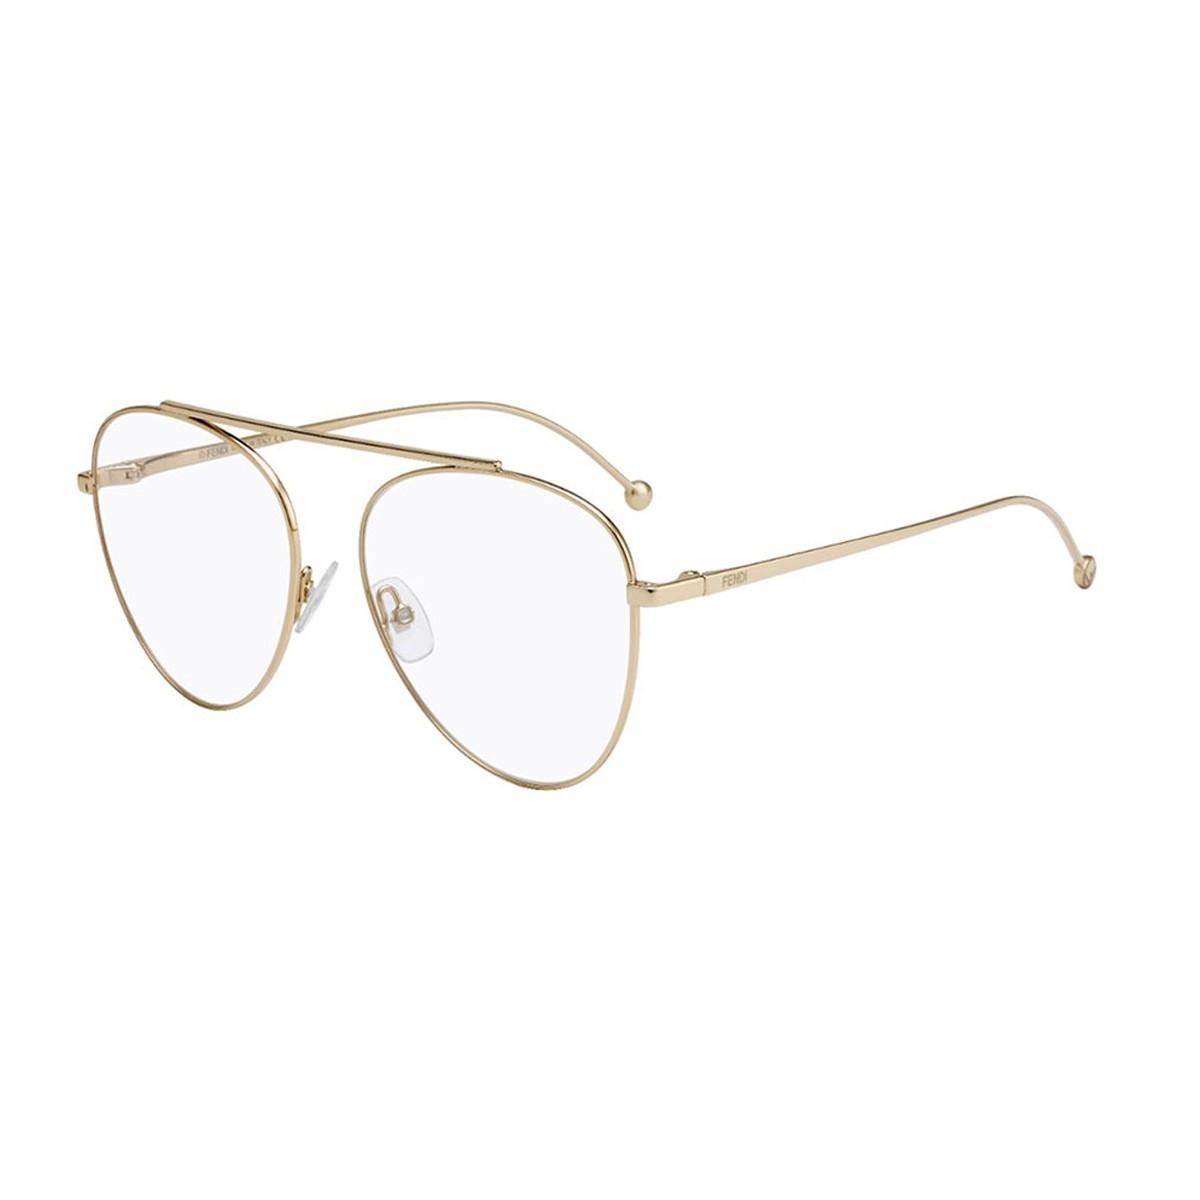 Fendi FF 0352 | Occhiali da vista Unisex